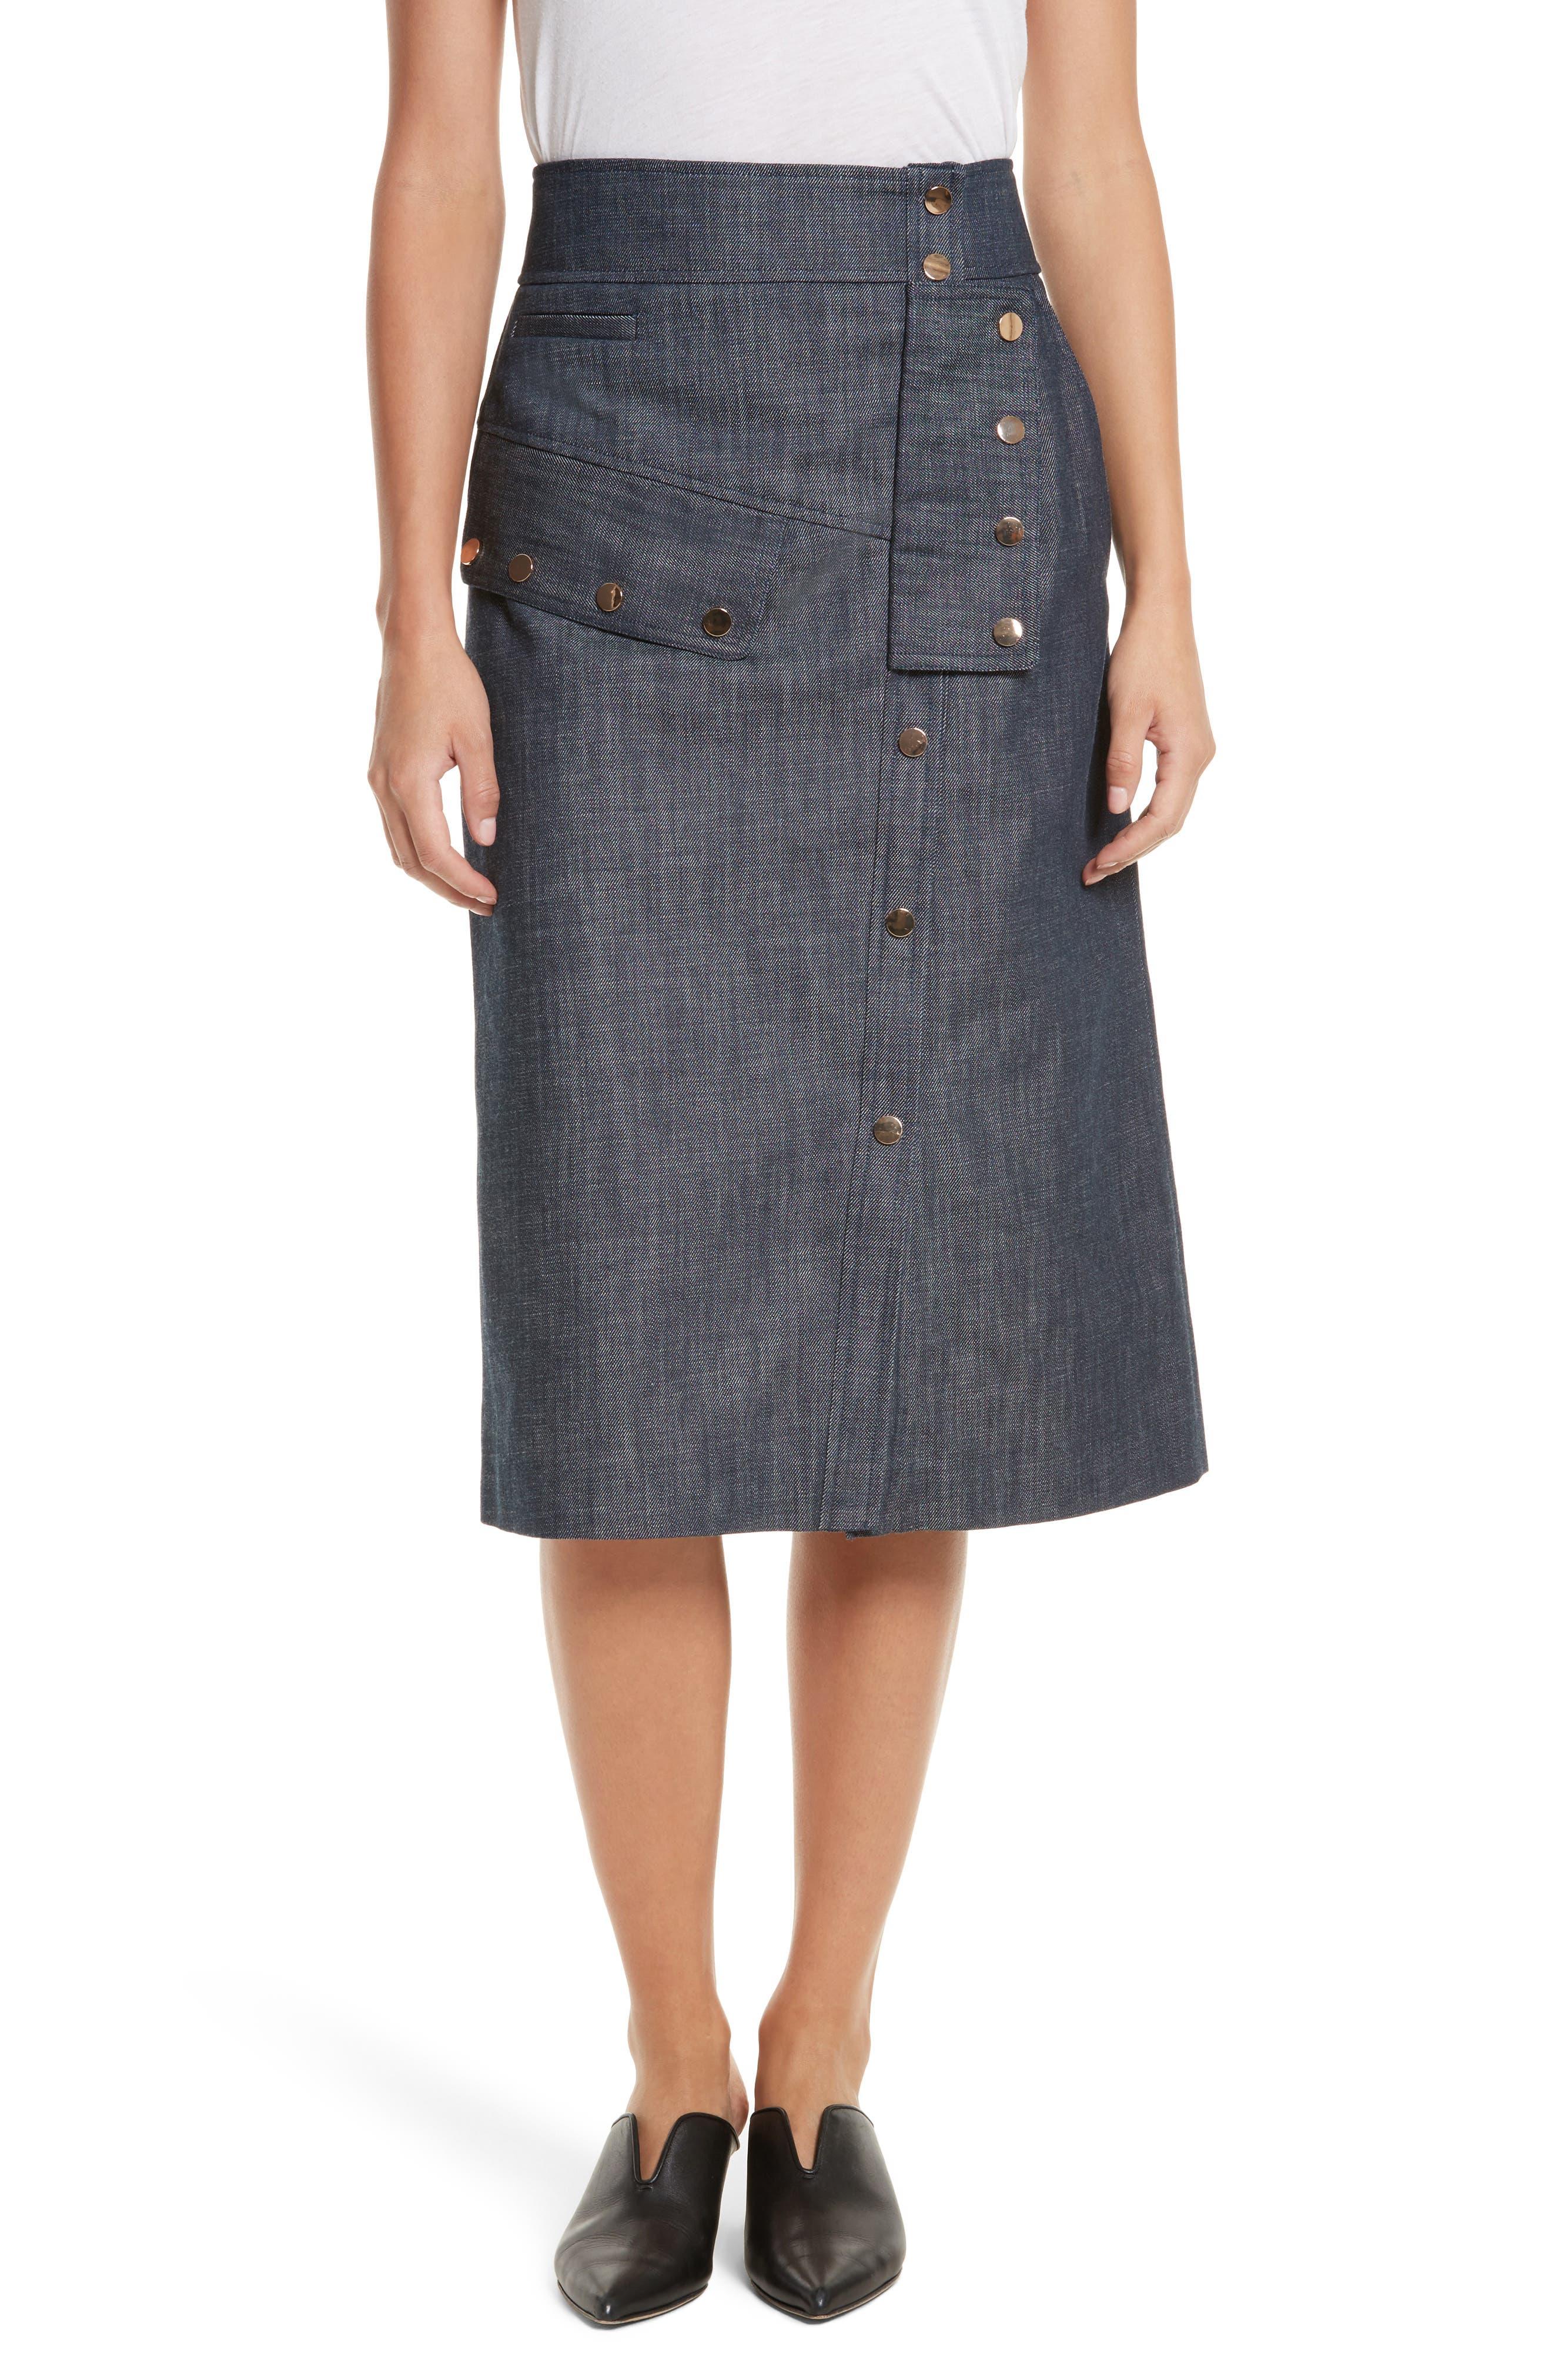 Alternate Image 1 Selected - Tibi Snap Front Raw Denim Skirt